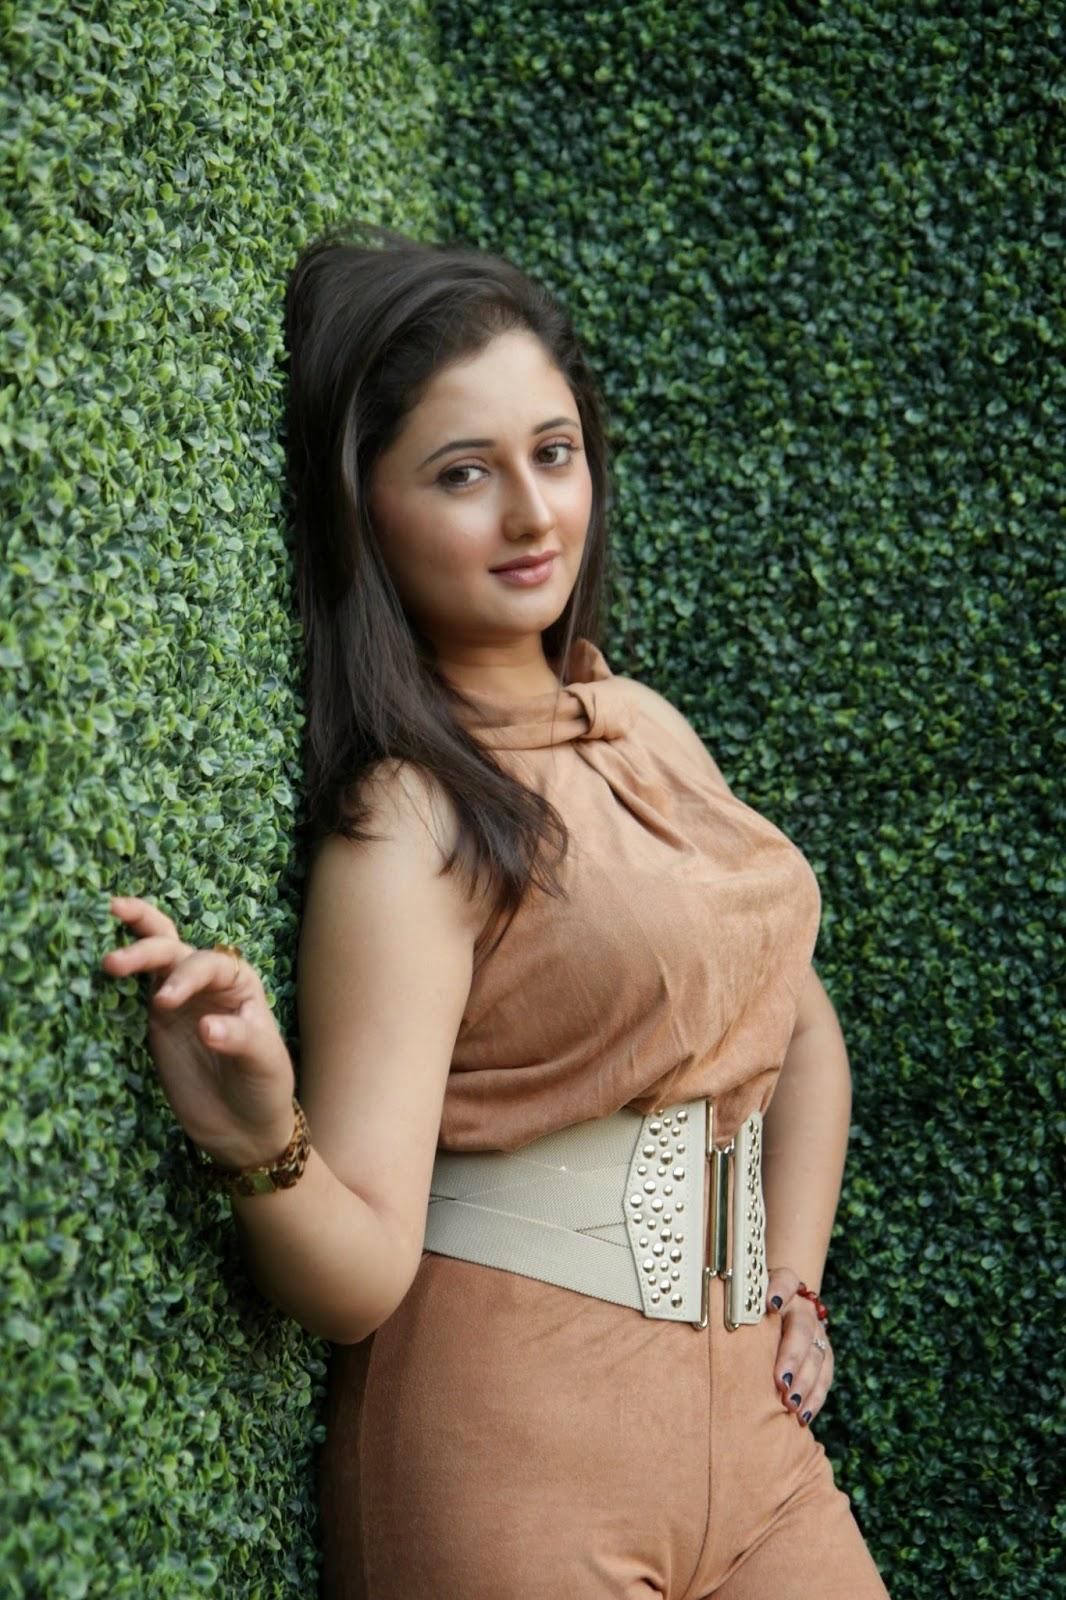 sexy image porn desai Rashmi